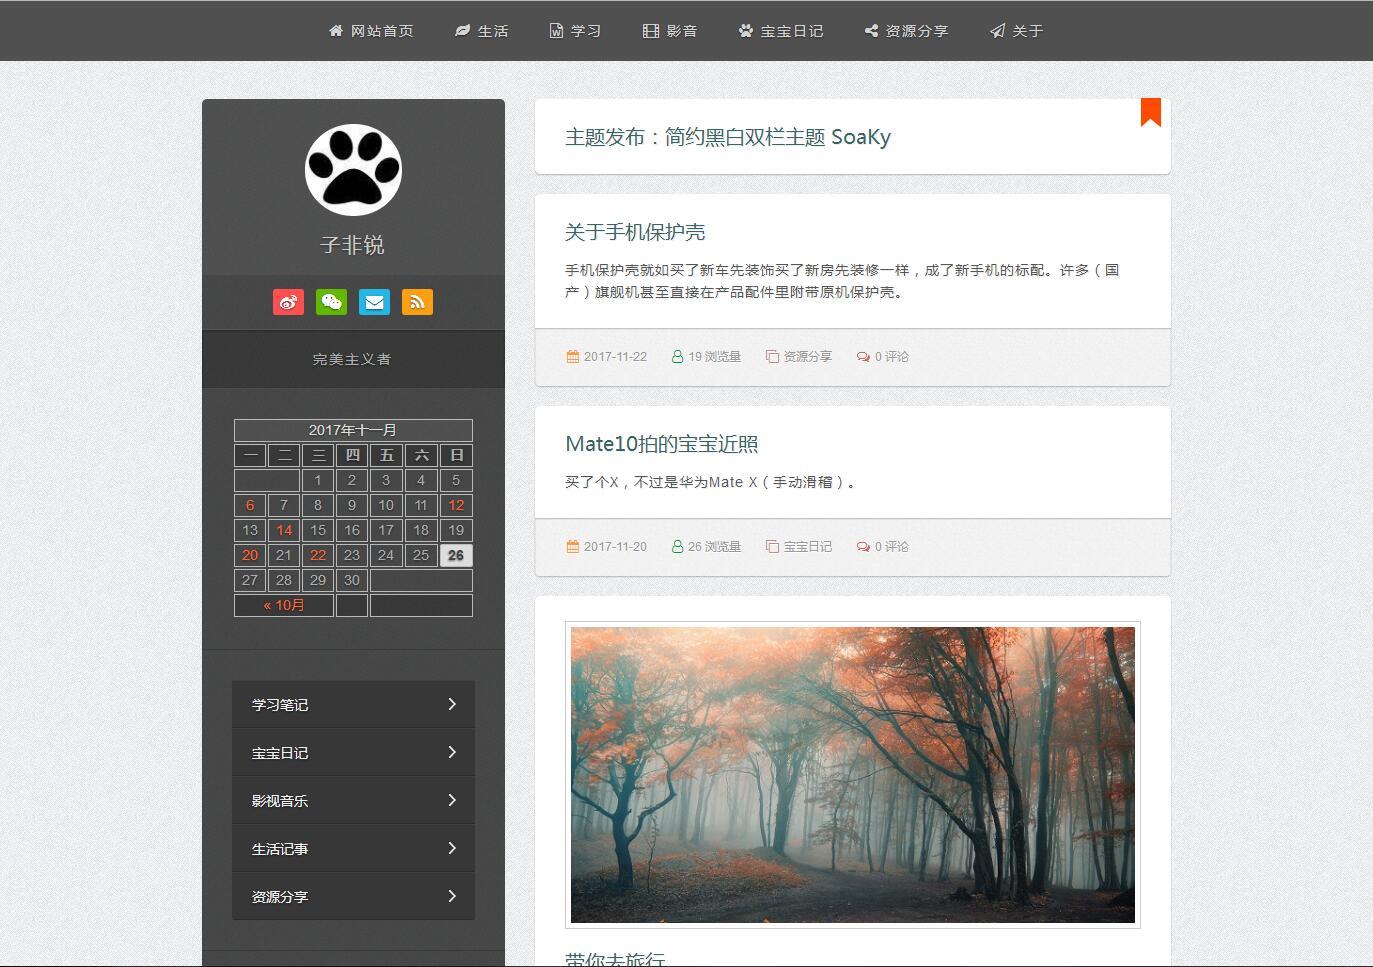 WordPress简约双栏博客主题 SoaKy V1.5免费分享